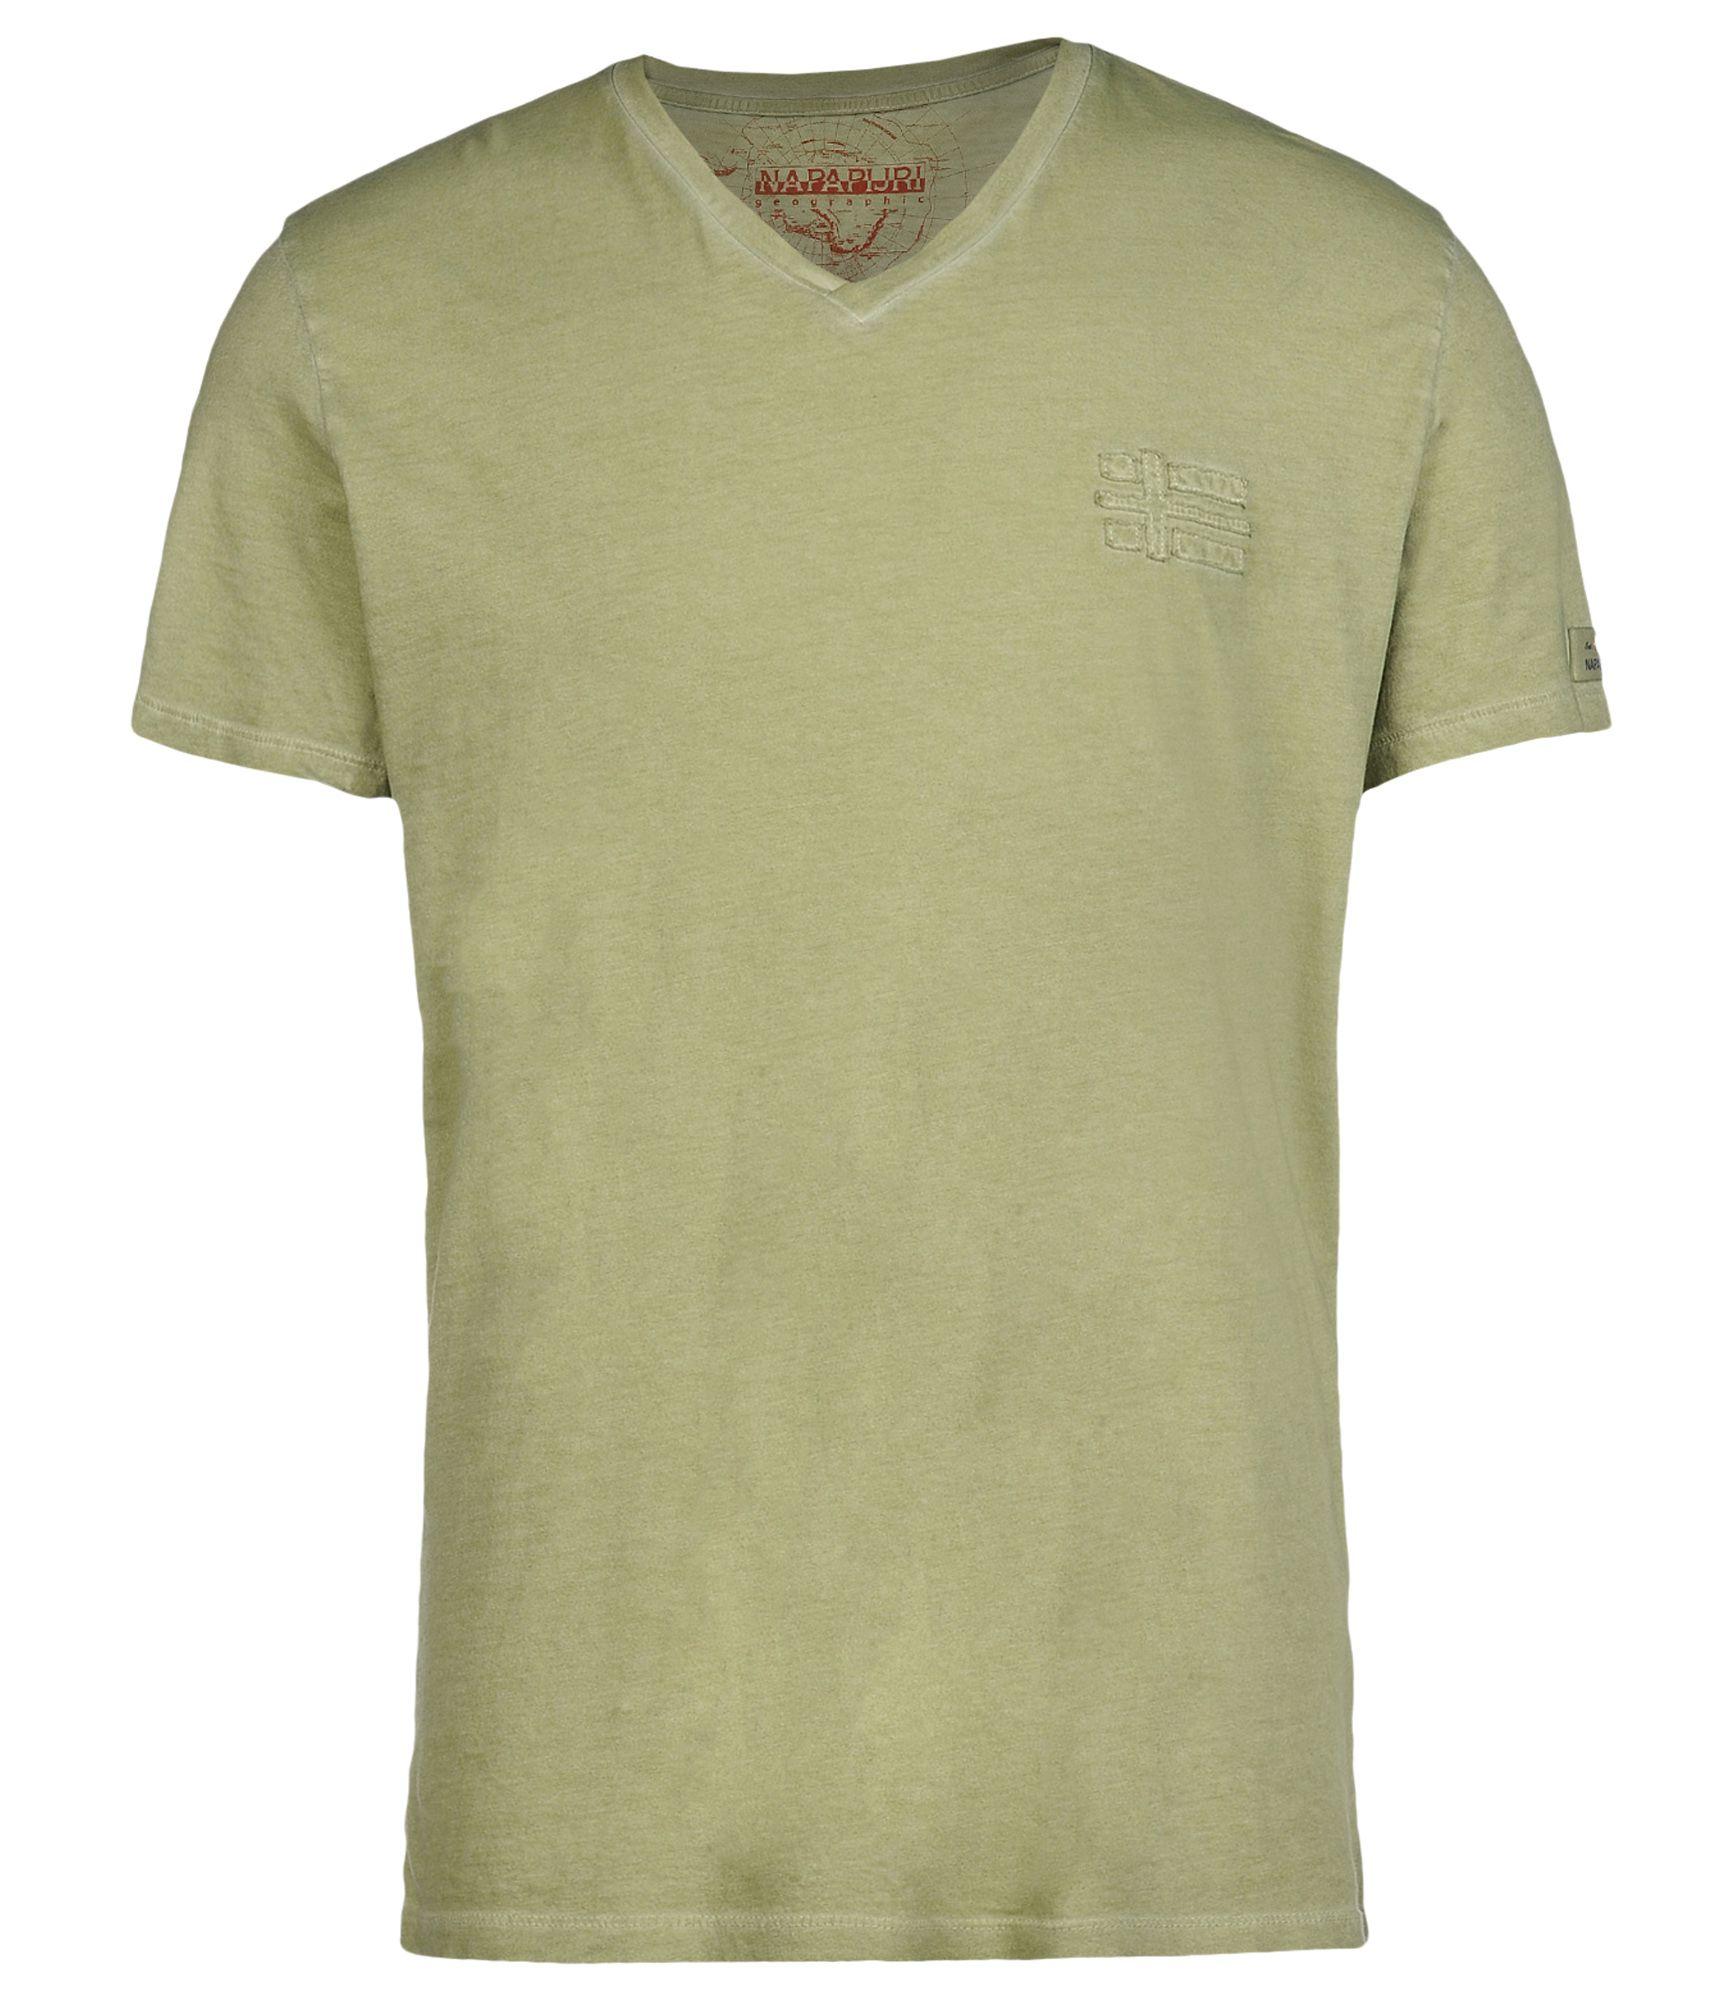 napapijri short sleeve t shirt in green for men lyst. Black Bedroom Furniture Sets. Home Design Ideas